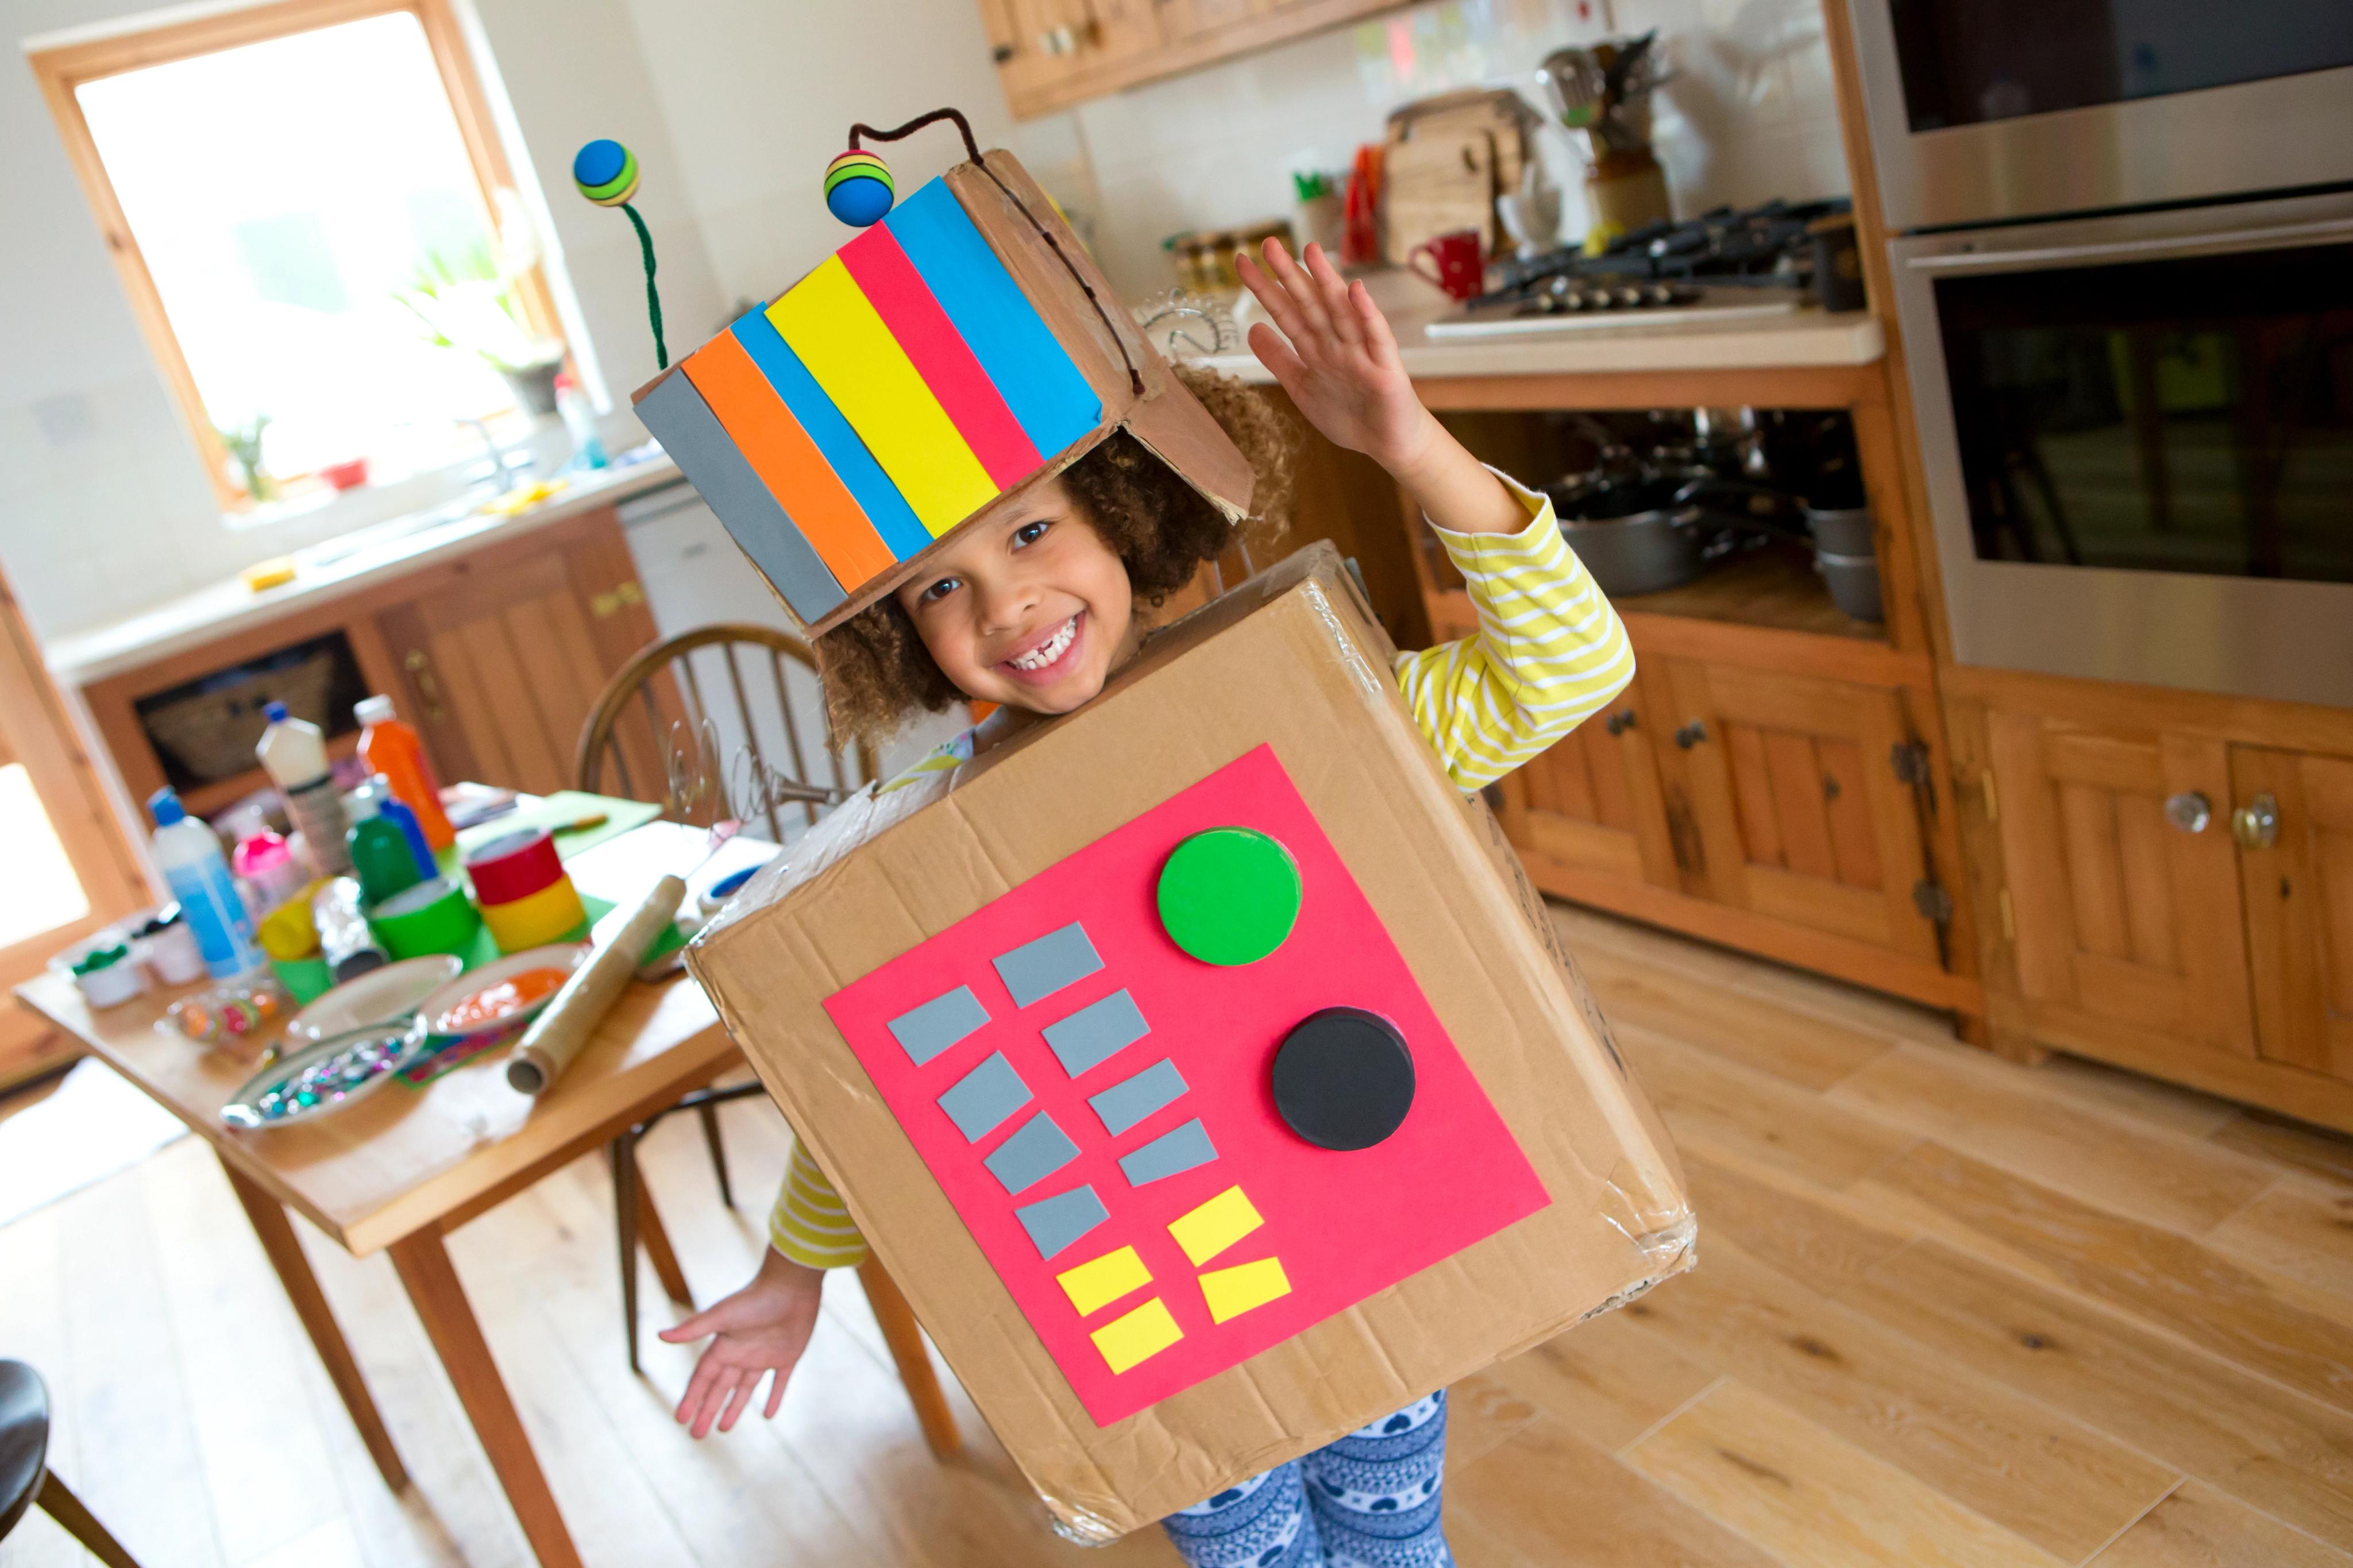 Blog_Activities_For_Kids_Blog_Cardboard_Robot.jpg